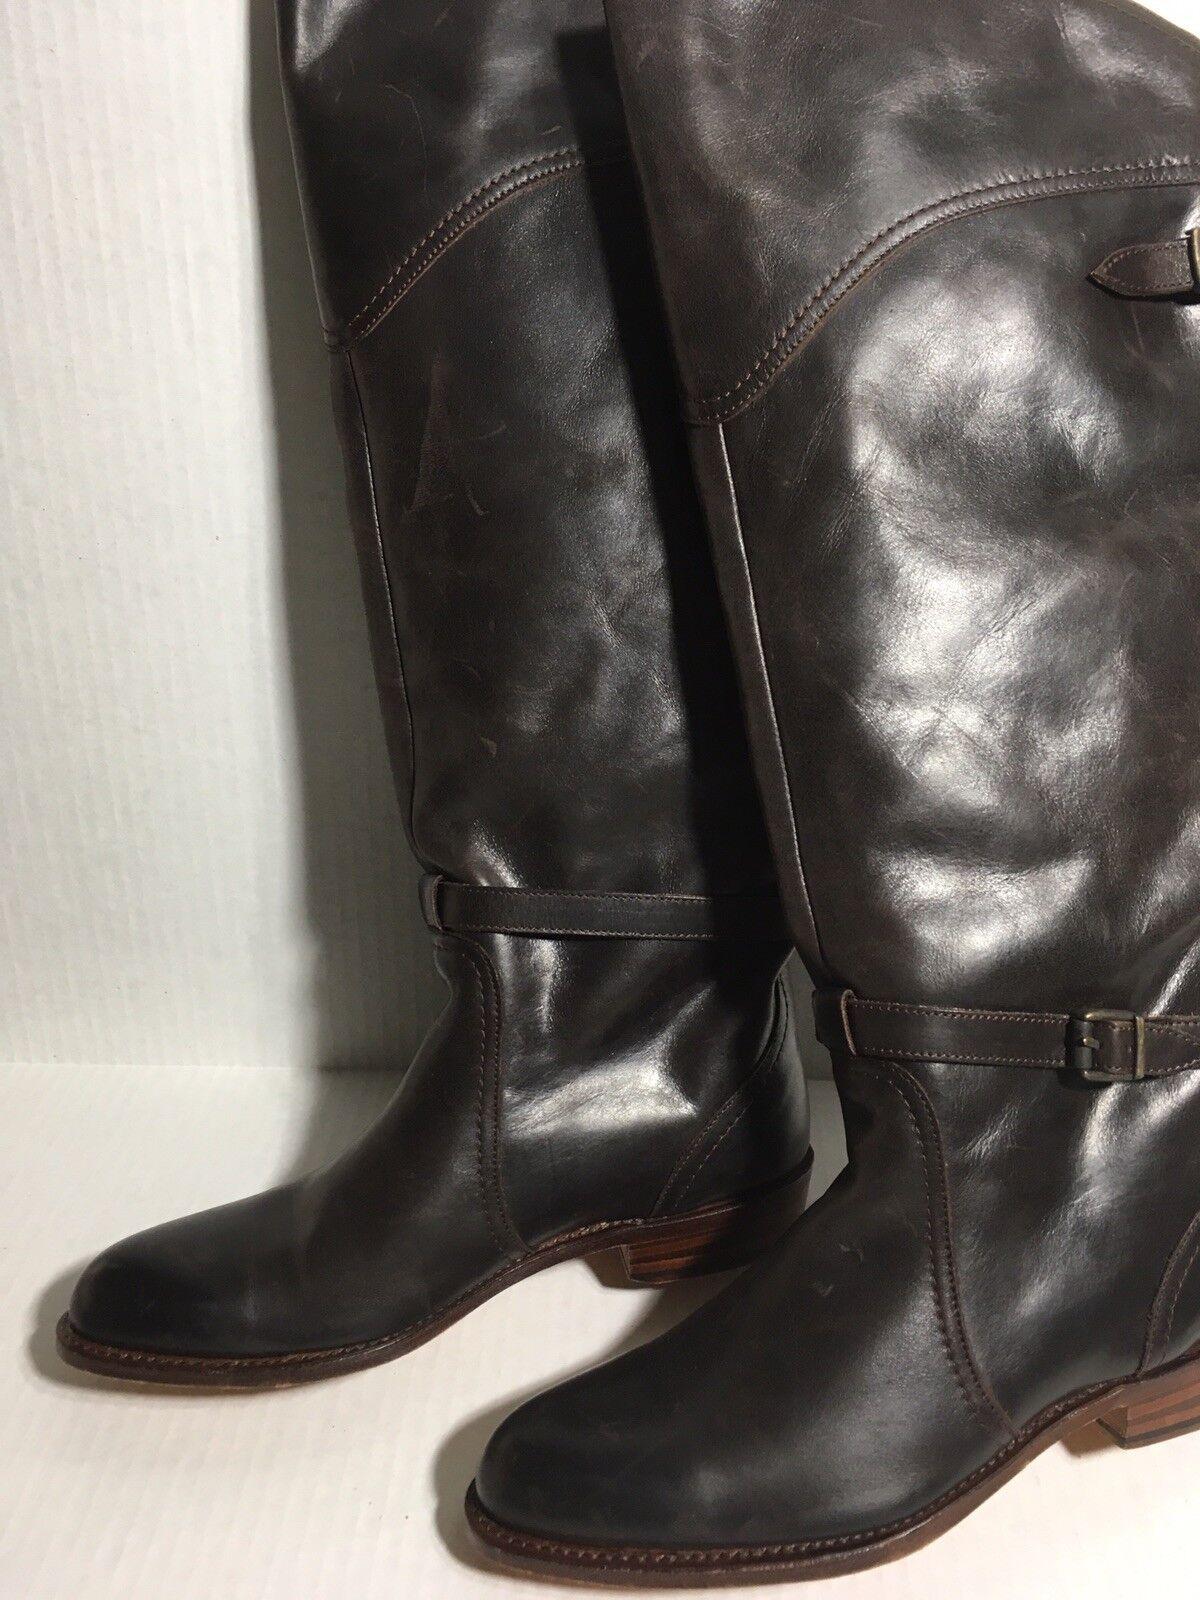 Frye Dorado Dark Brown Leather Buckle Buckle Buckle Riding Boots Women's shoes Sz10 M RTL 698 283234